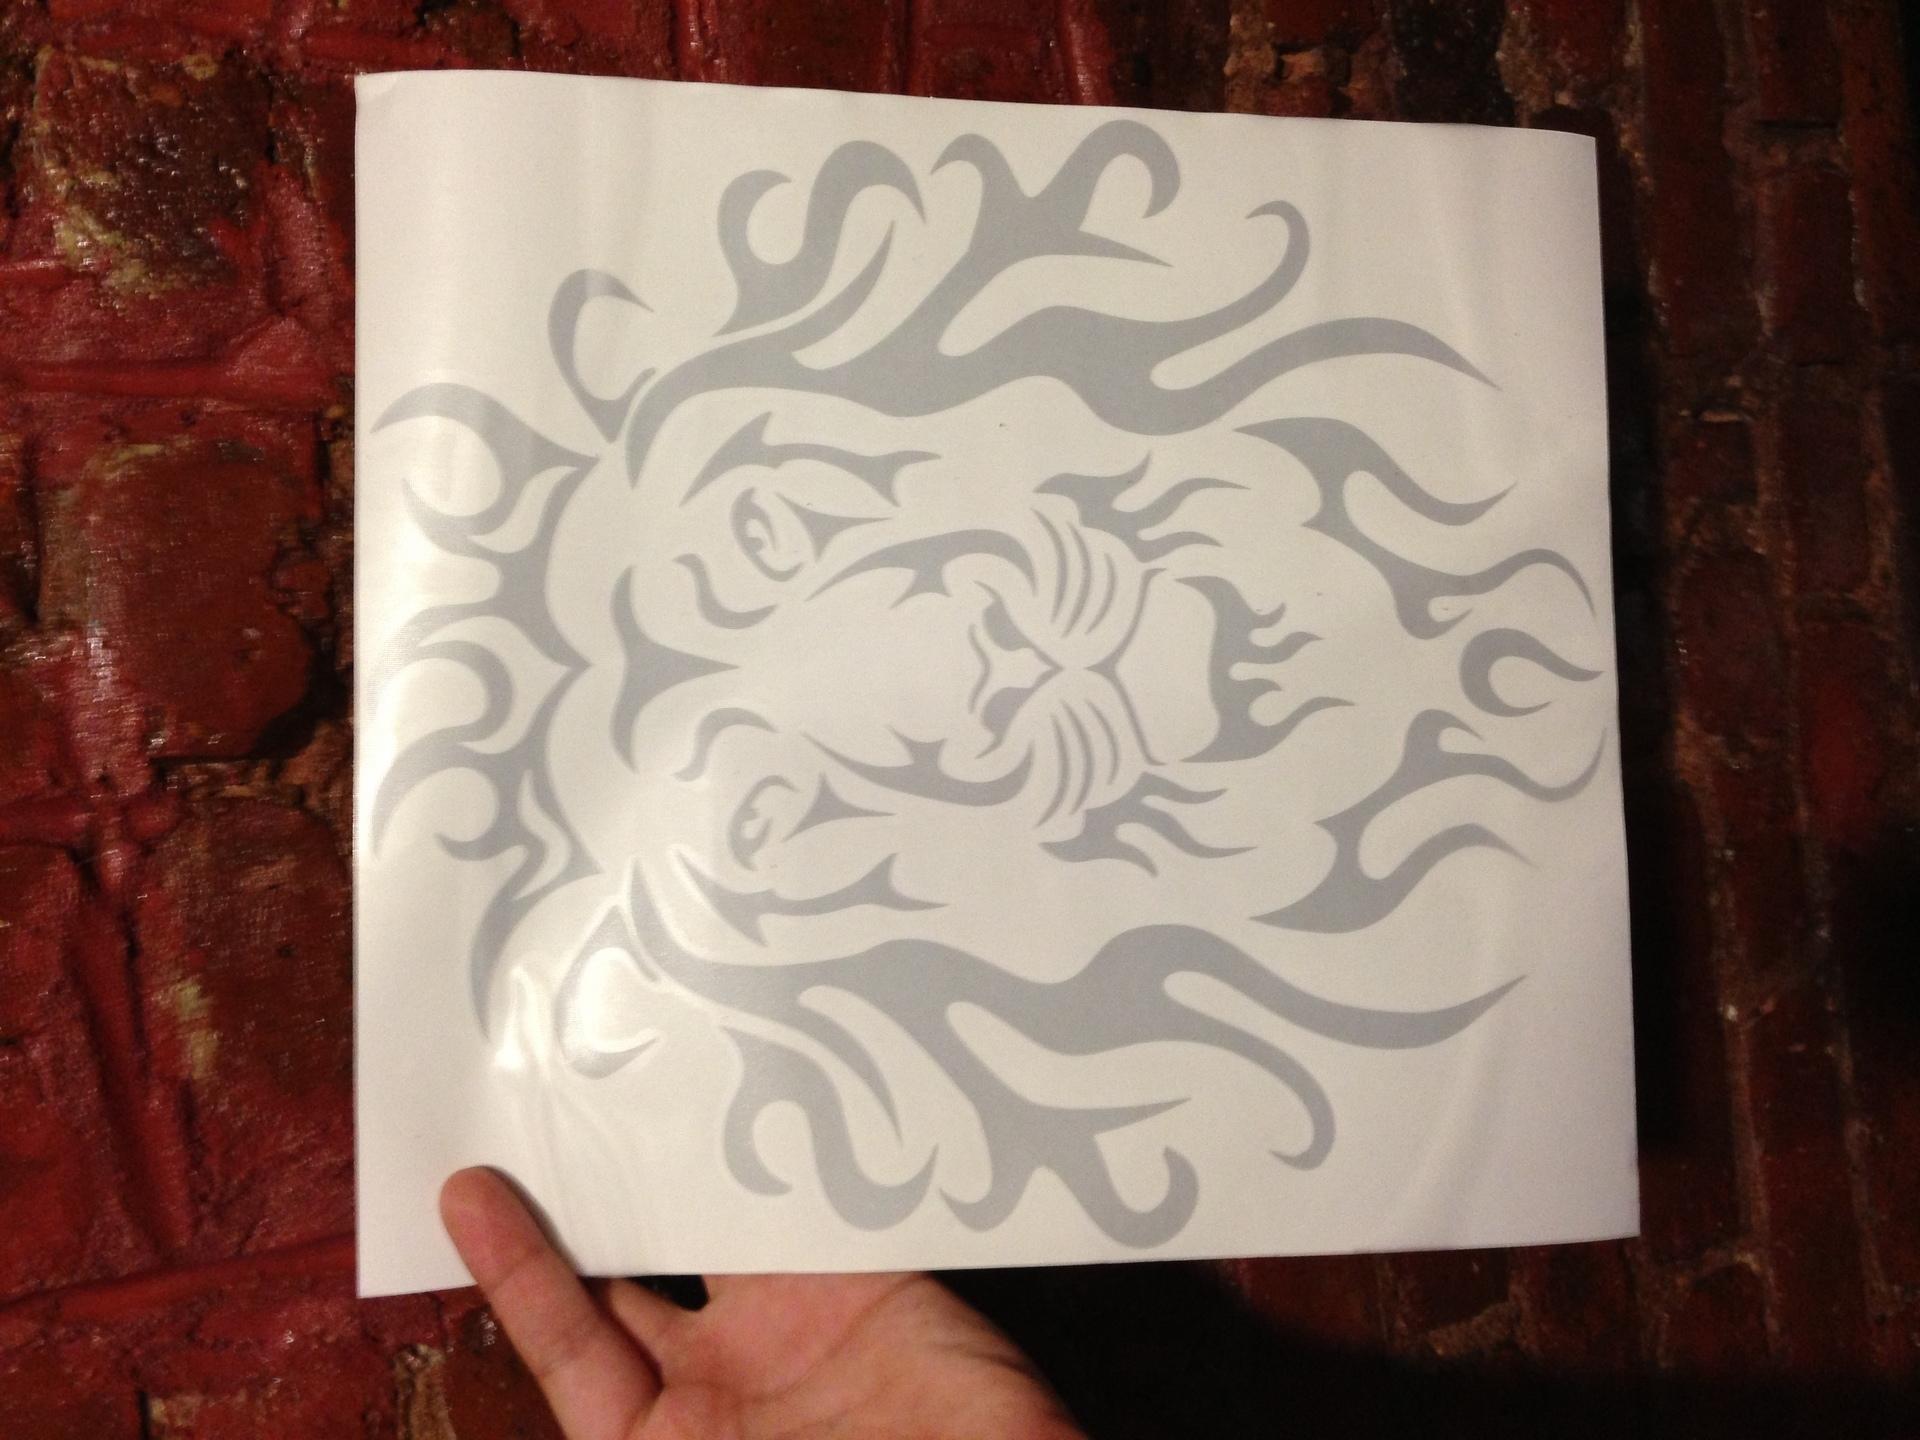 Jon's photograph of their Tribal Lion Head Sticker